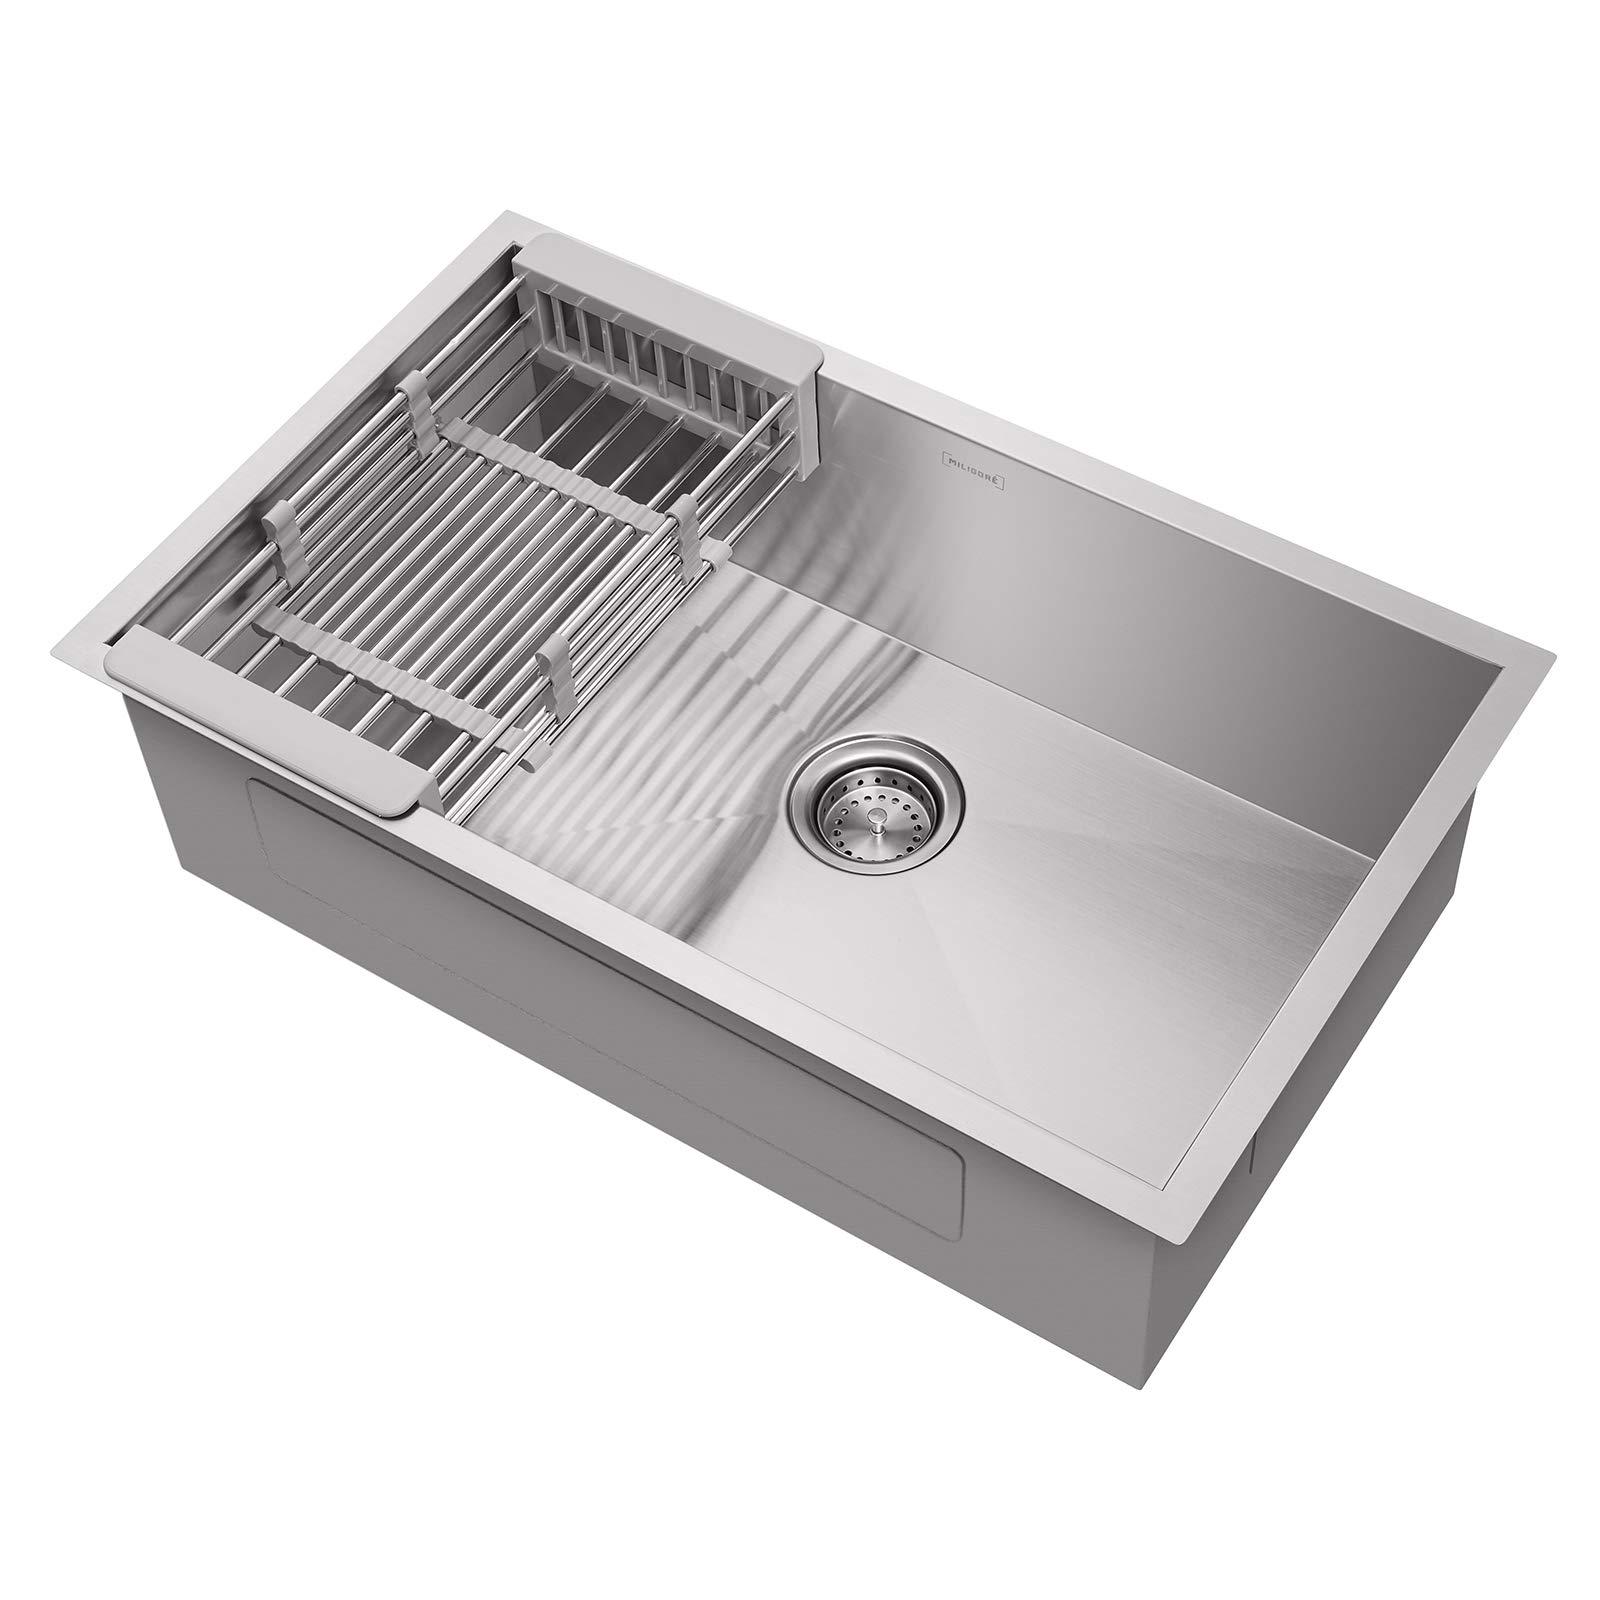 Miligore 30'' x 18'' x 9'' Deep Single Bowl Undermount Zero Radius Stainless Steel Kitchen Sink - Includes Drain/Adjustable Dish Rack by Miligore (Image #1)